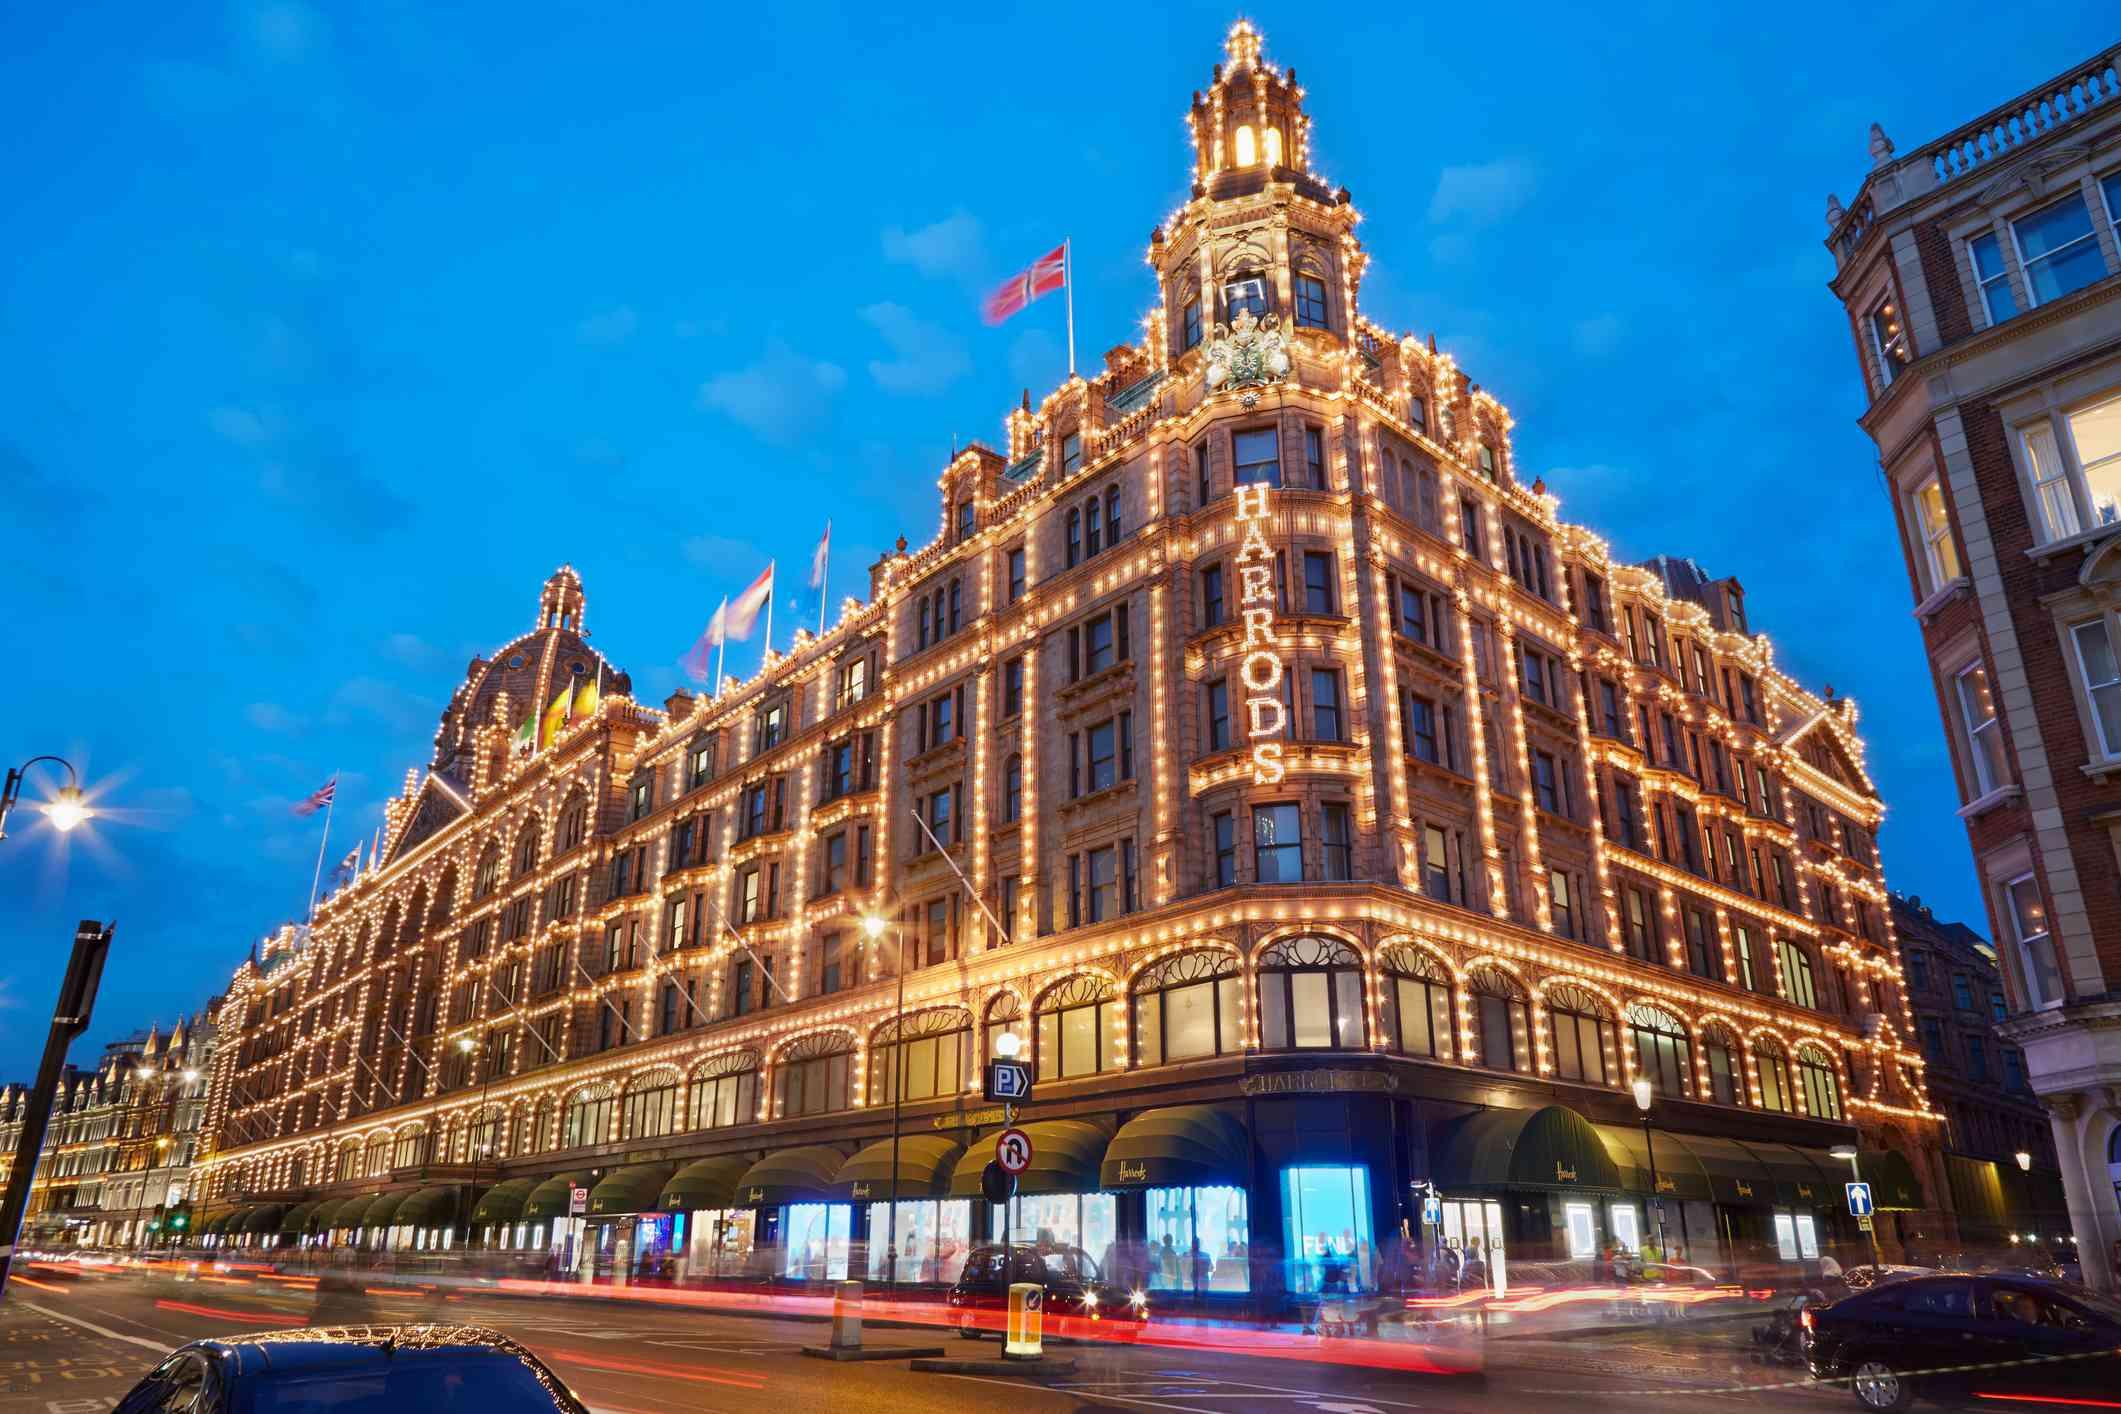 Harrods, luxury shopping in the evening in London